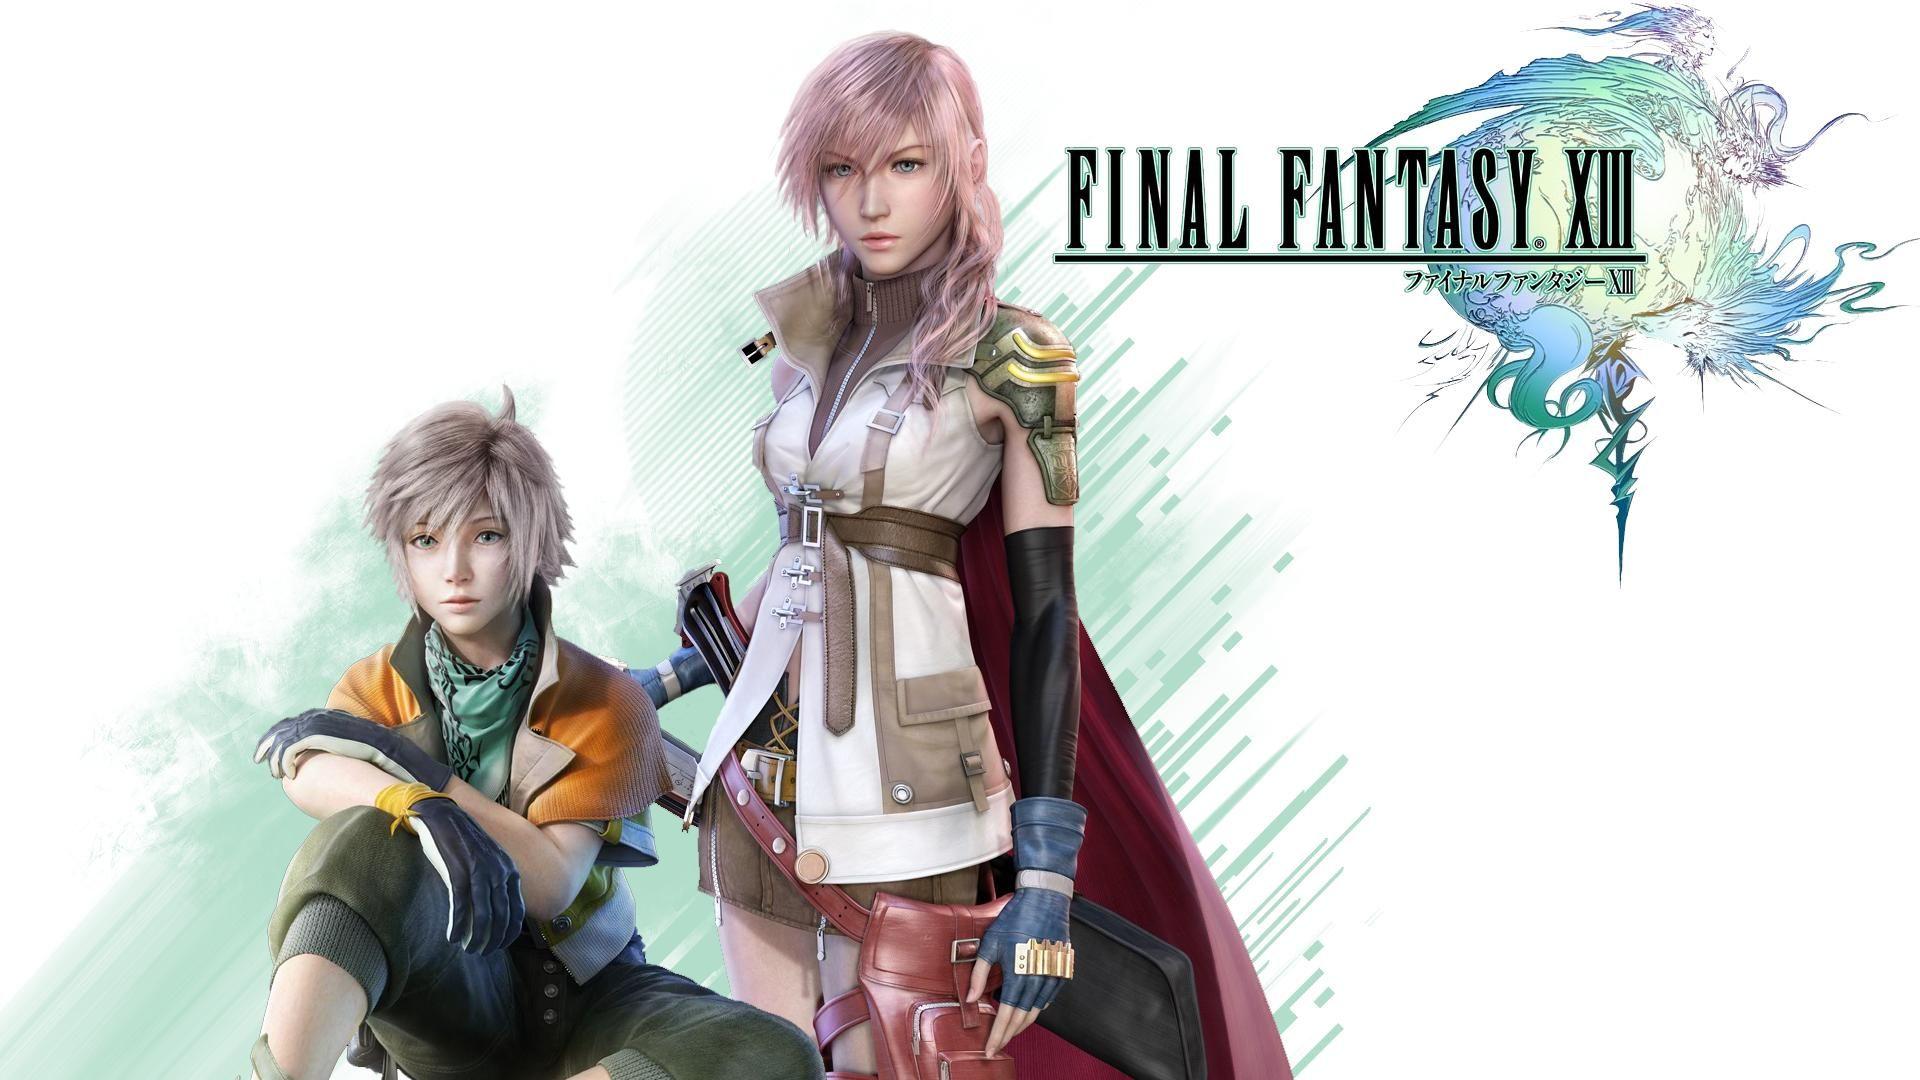 Final Fantasy Xiii Pc Gameplay 1080p Wallpaper Highpeak